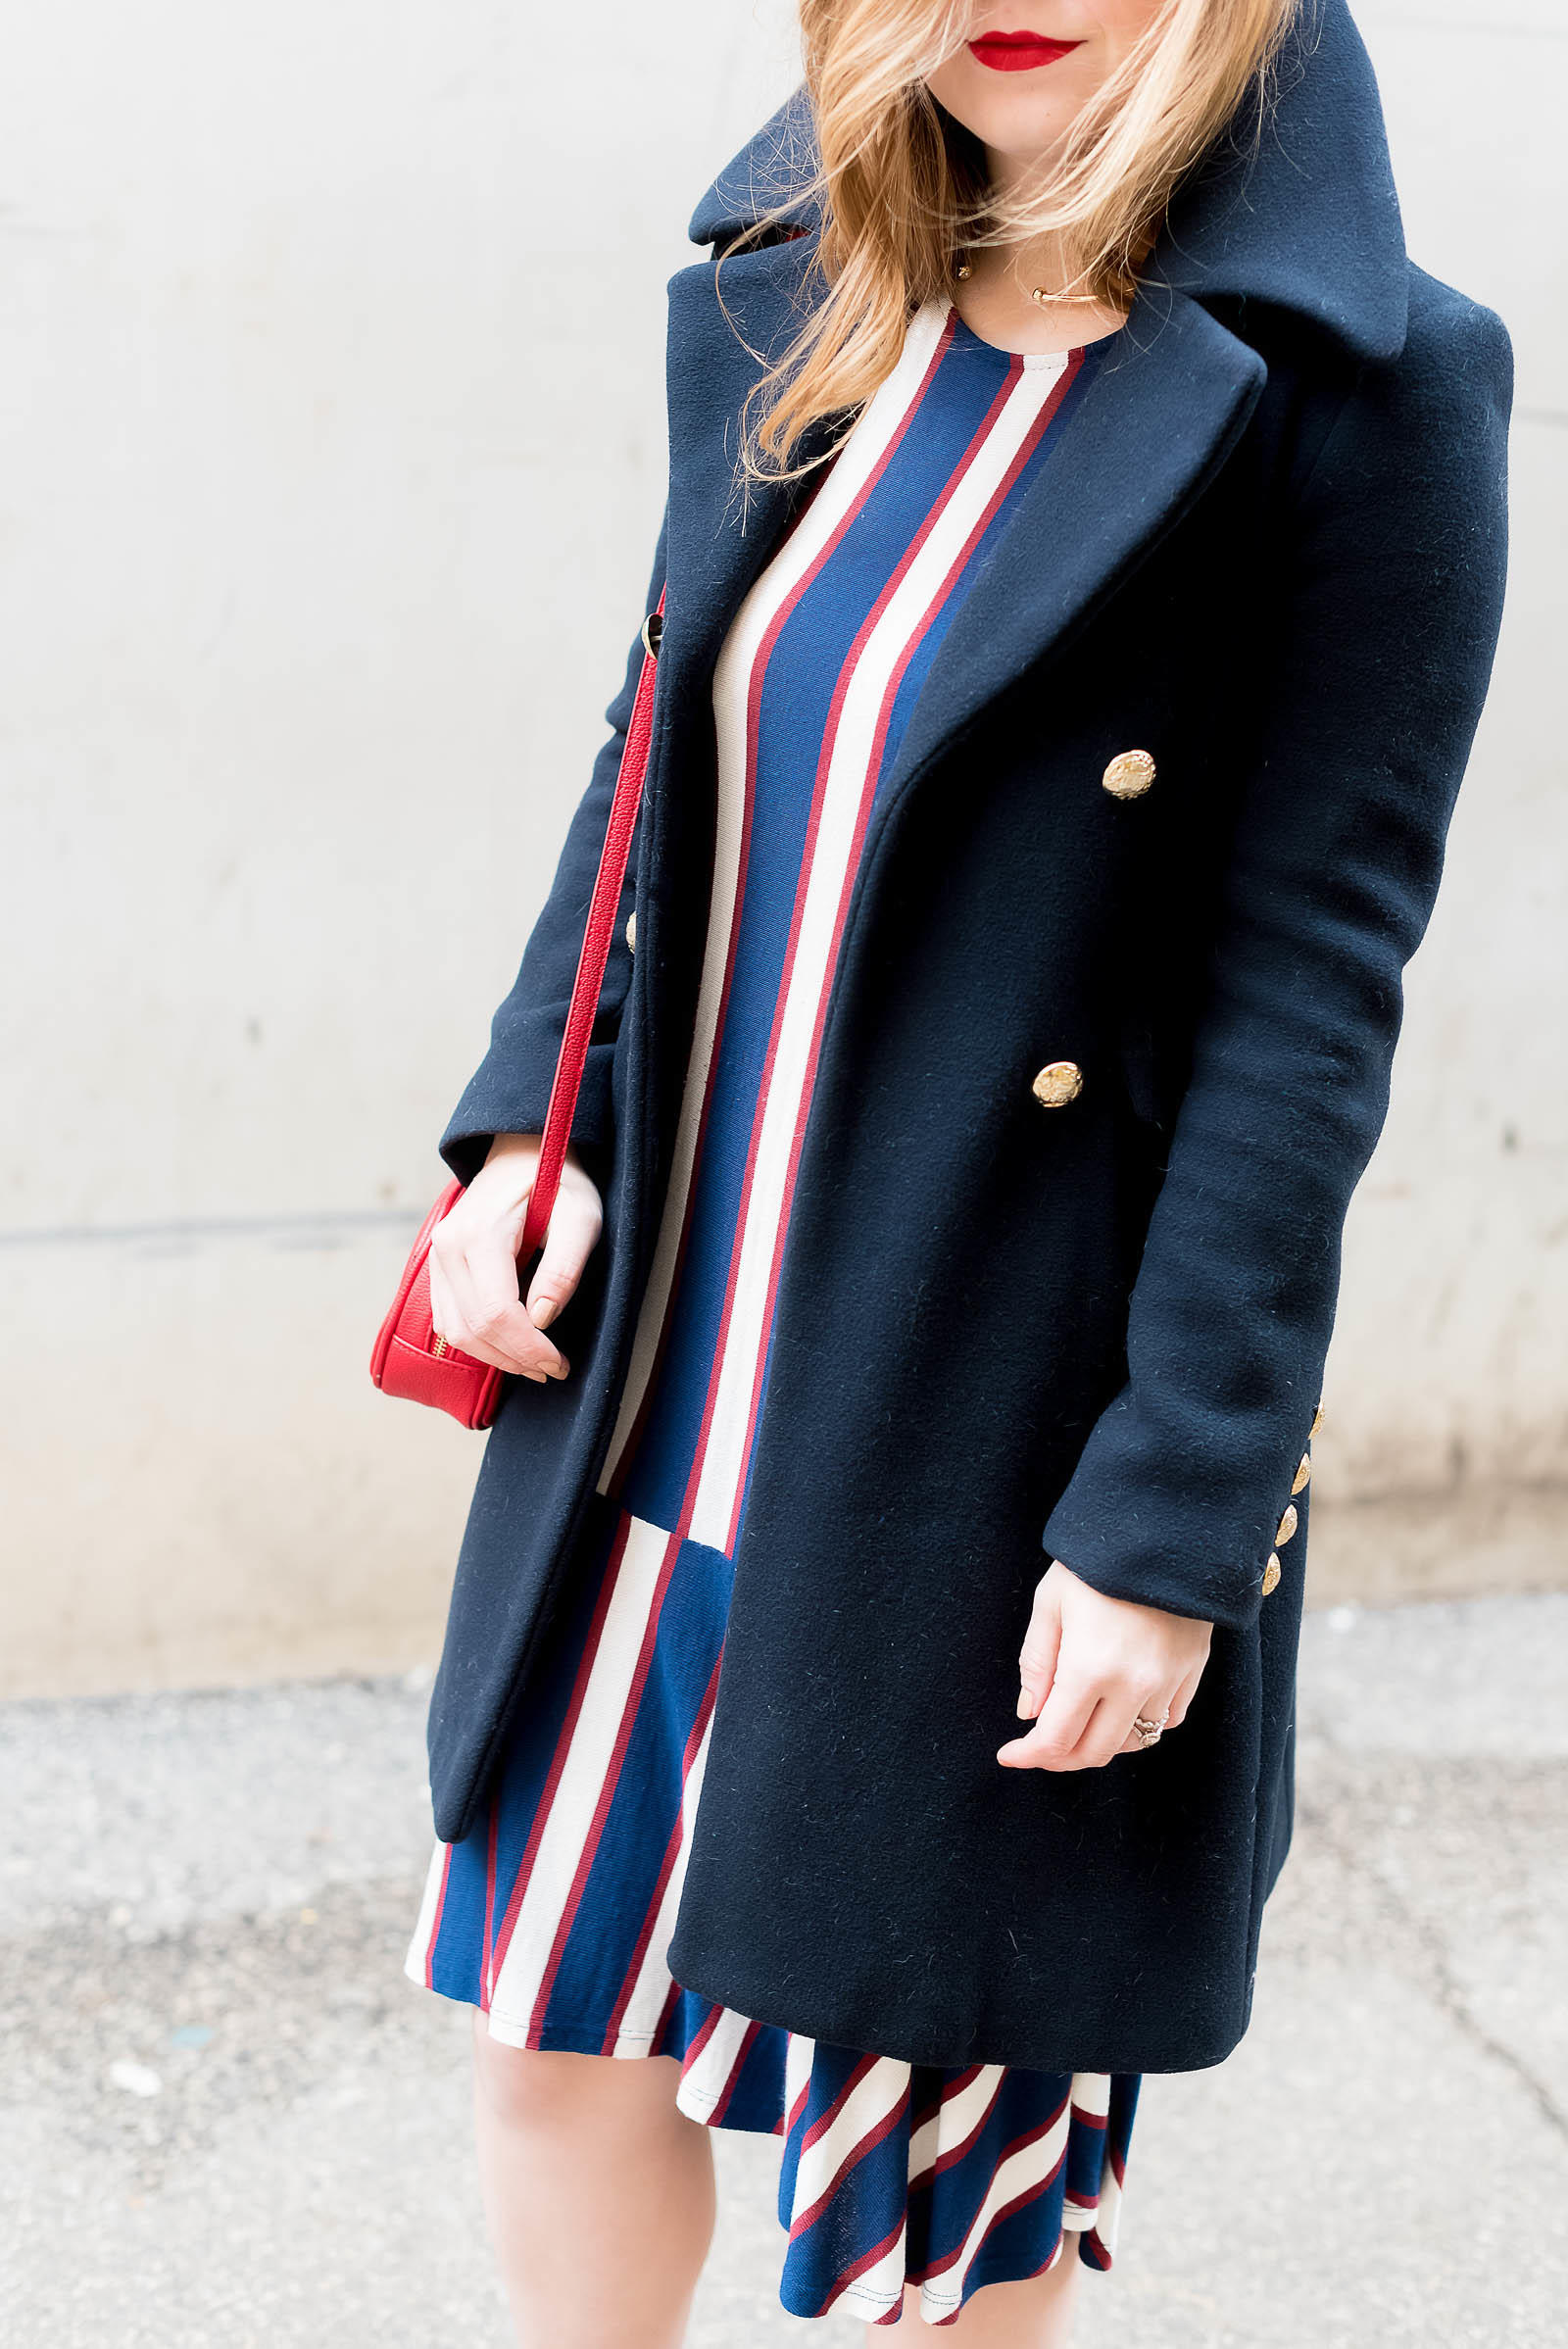 Zara Military Coat Stripe Red Pump Outfit Nautical